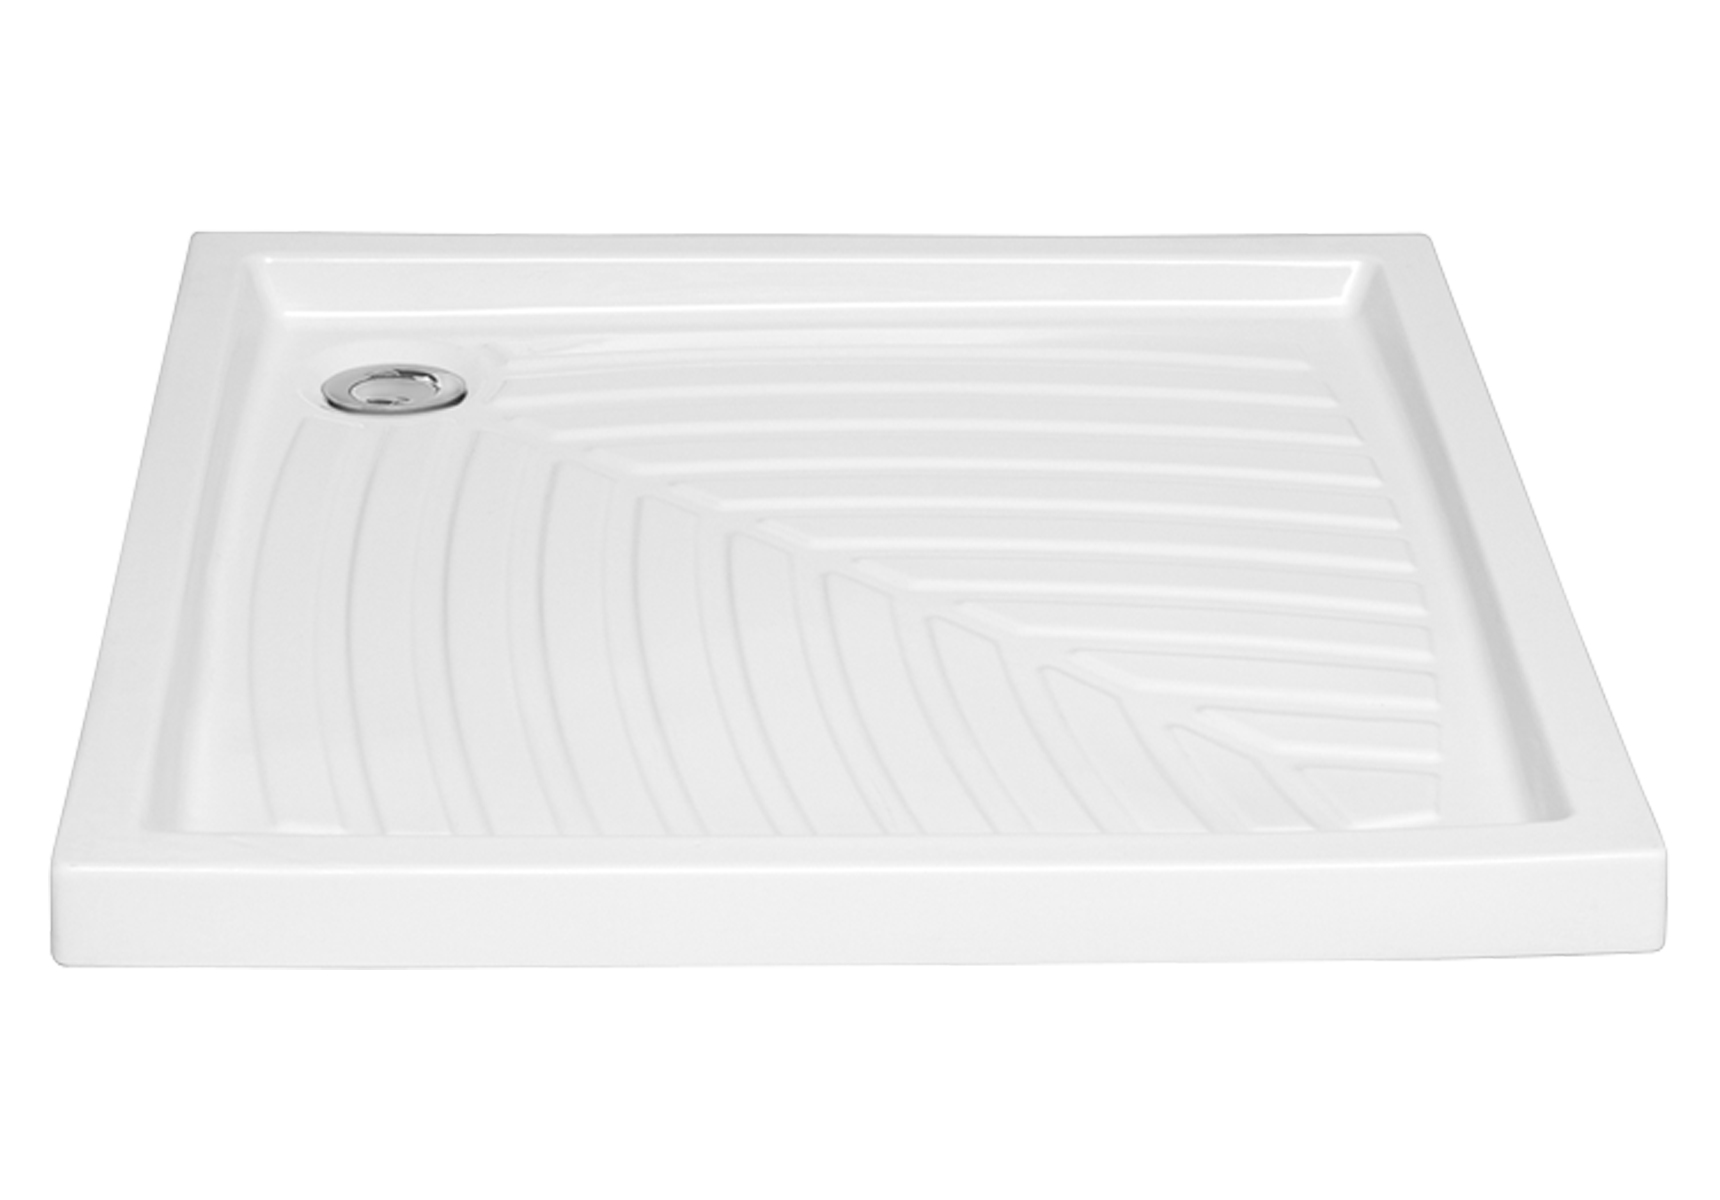 Arkitekt receveur à encastrer ou à poser fond extra plat, 90  x  90 cm, blanc